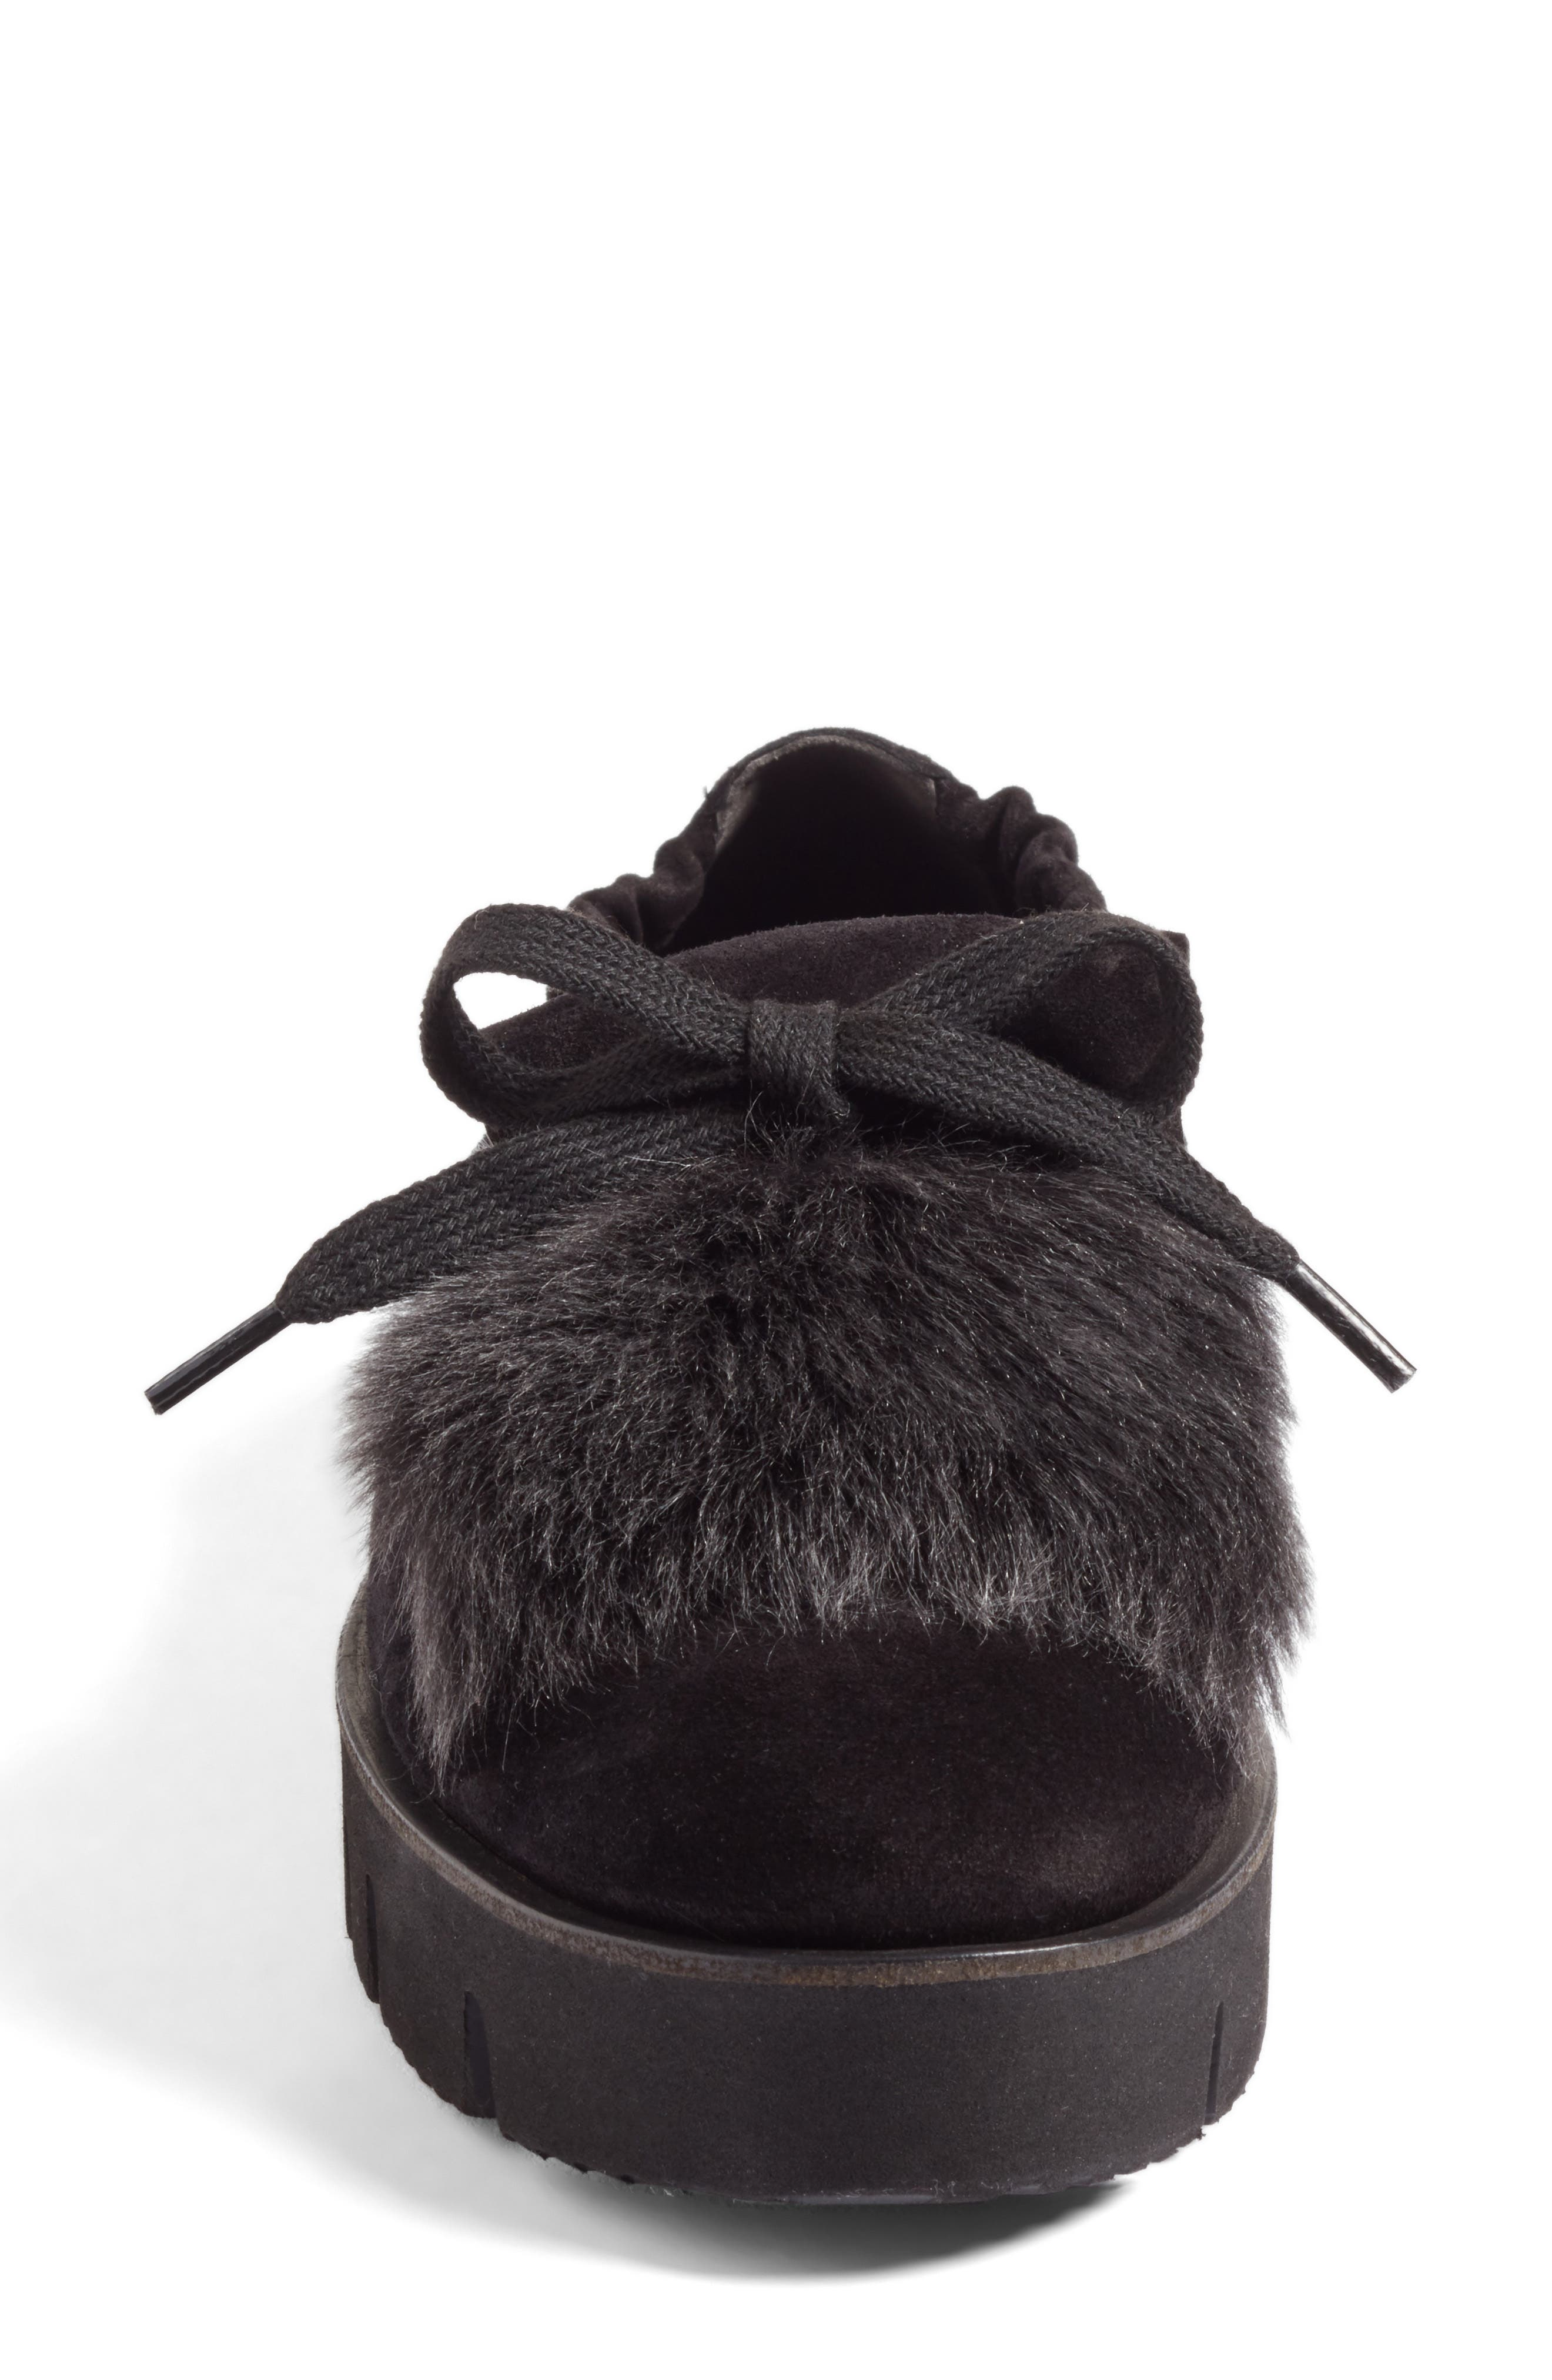 Kennel & Schmenger Malu Suede & Genuine Shearling Slip-On Sneaker,                             Alternate thumbnail 4, color,                             Black